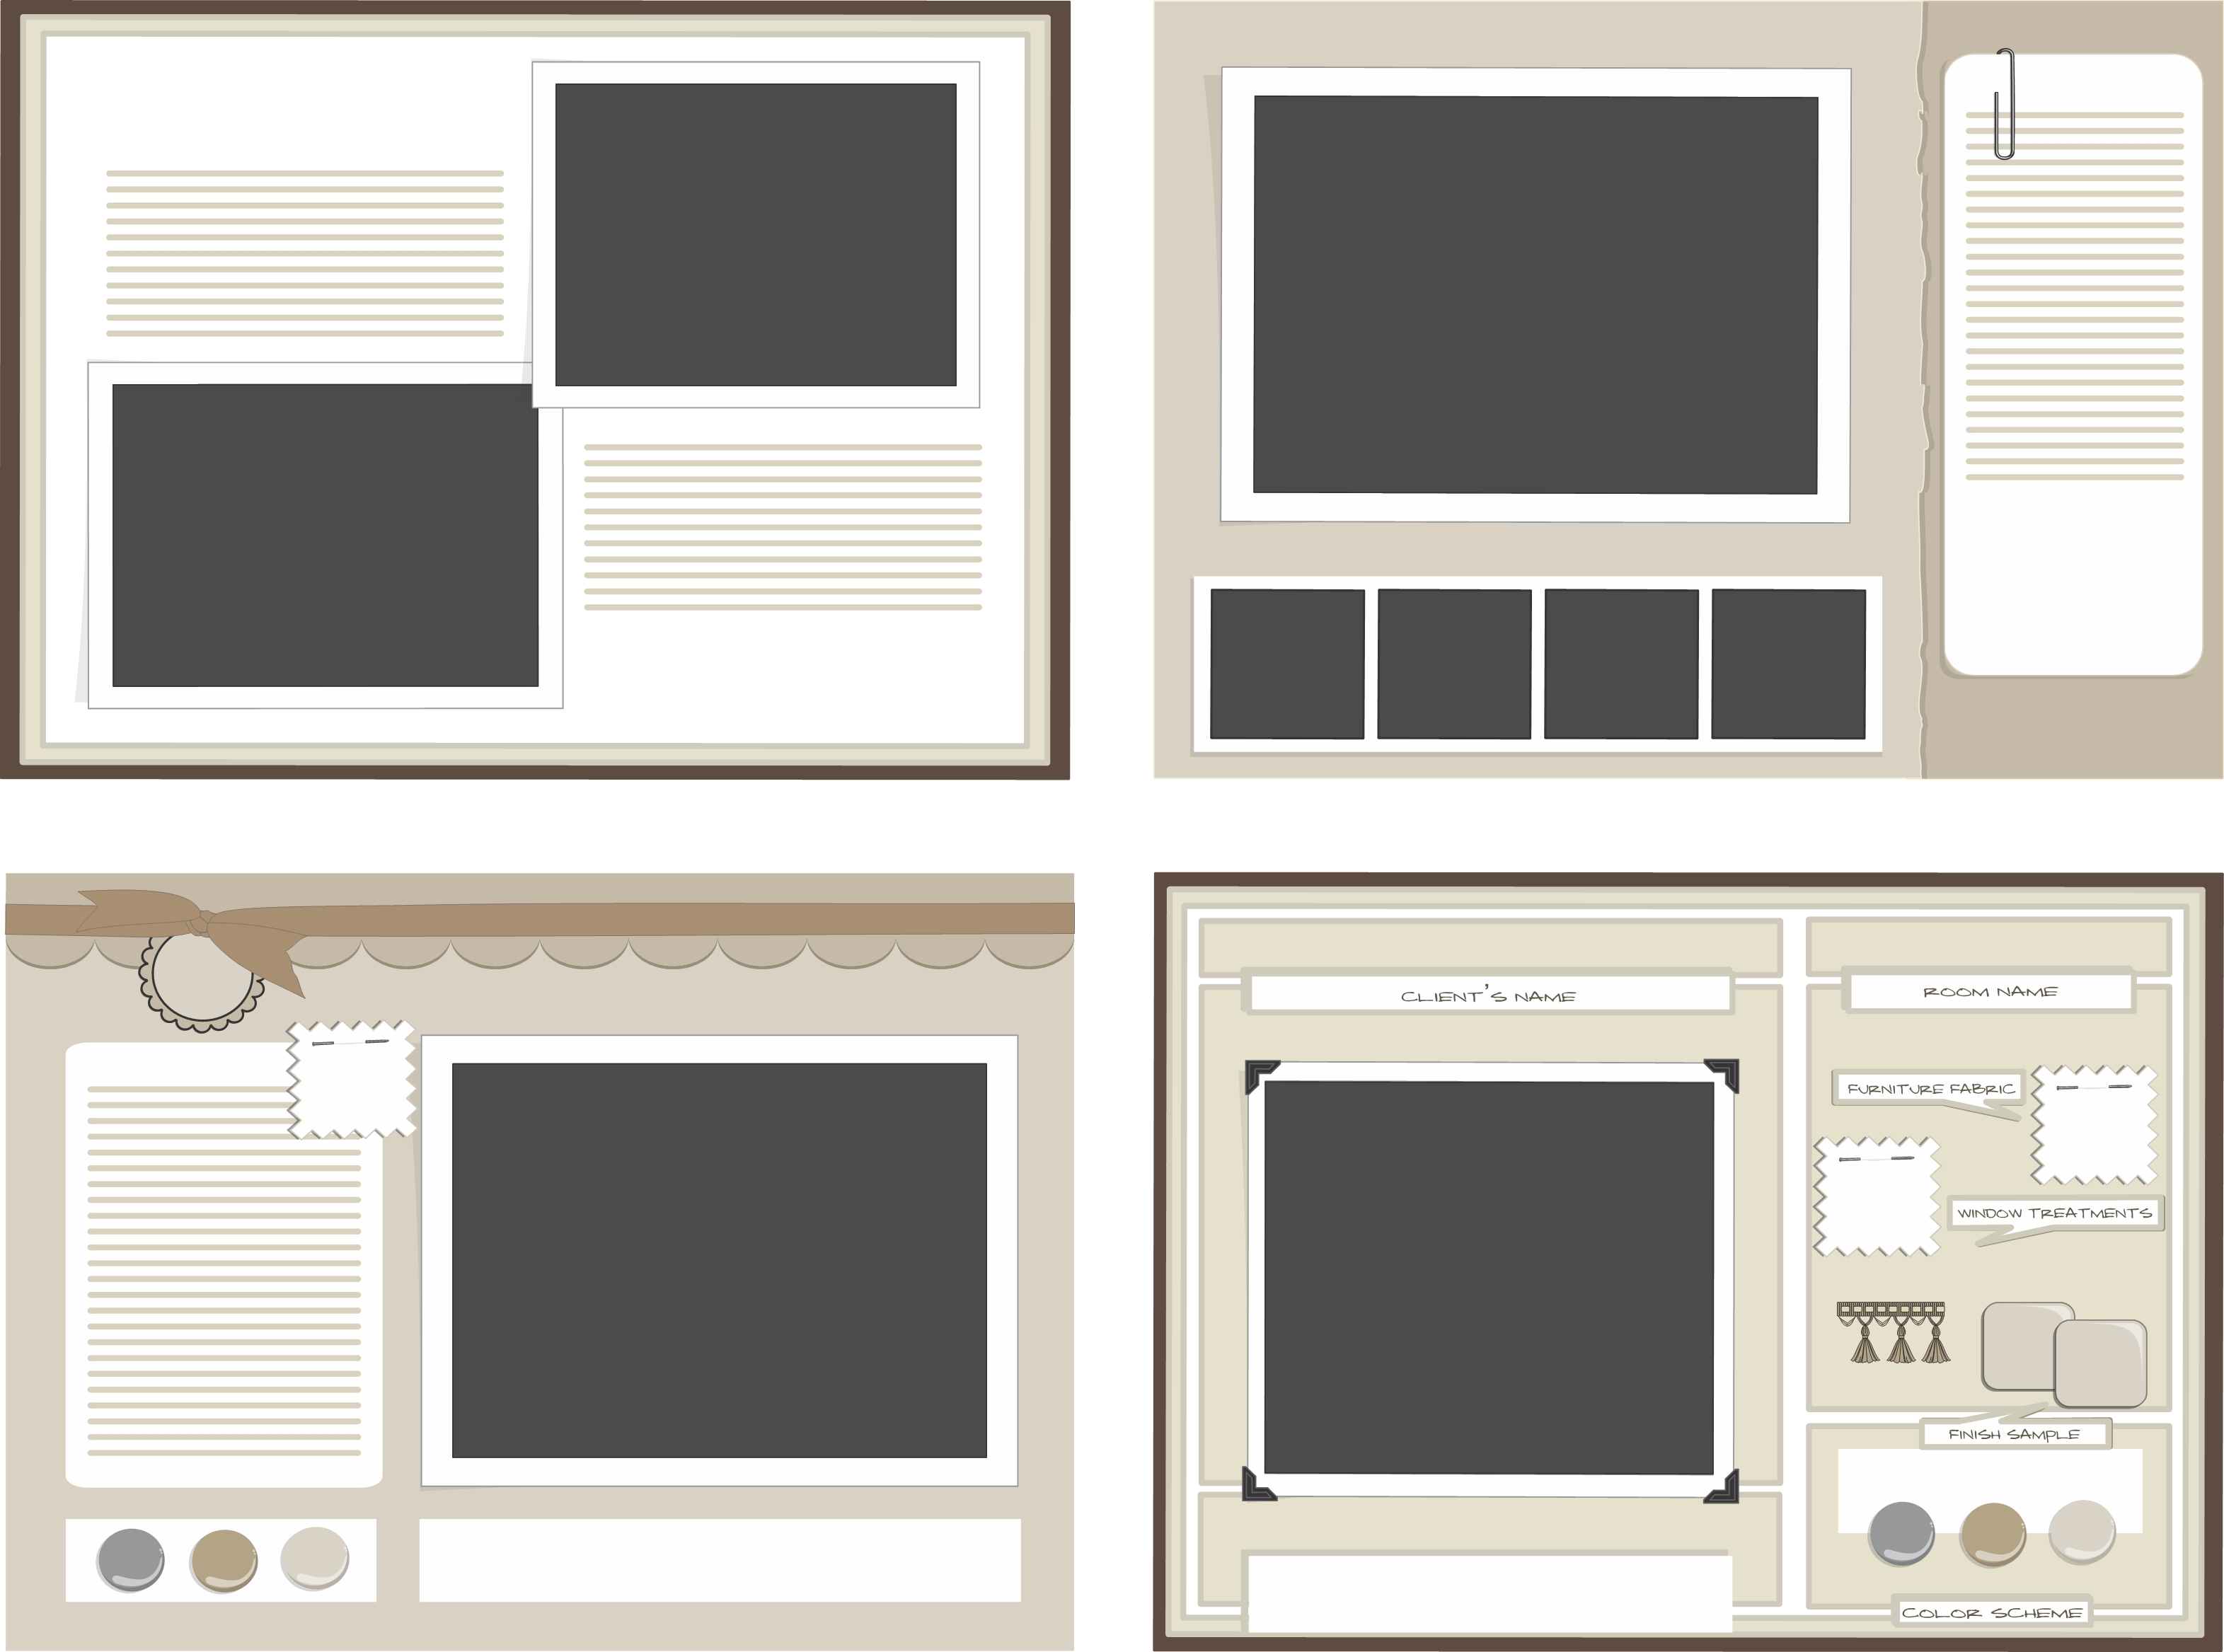 Minutesmatter New Storyboard Module added to Studio Minutesmatter